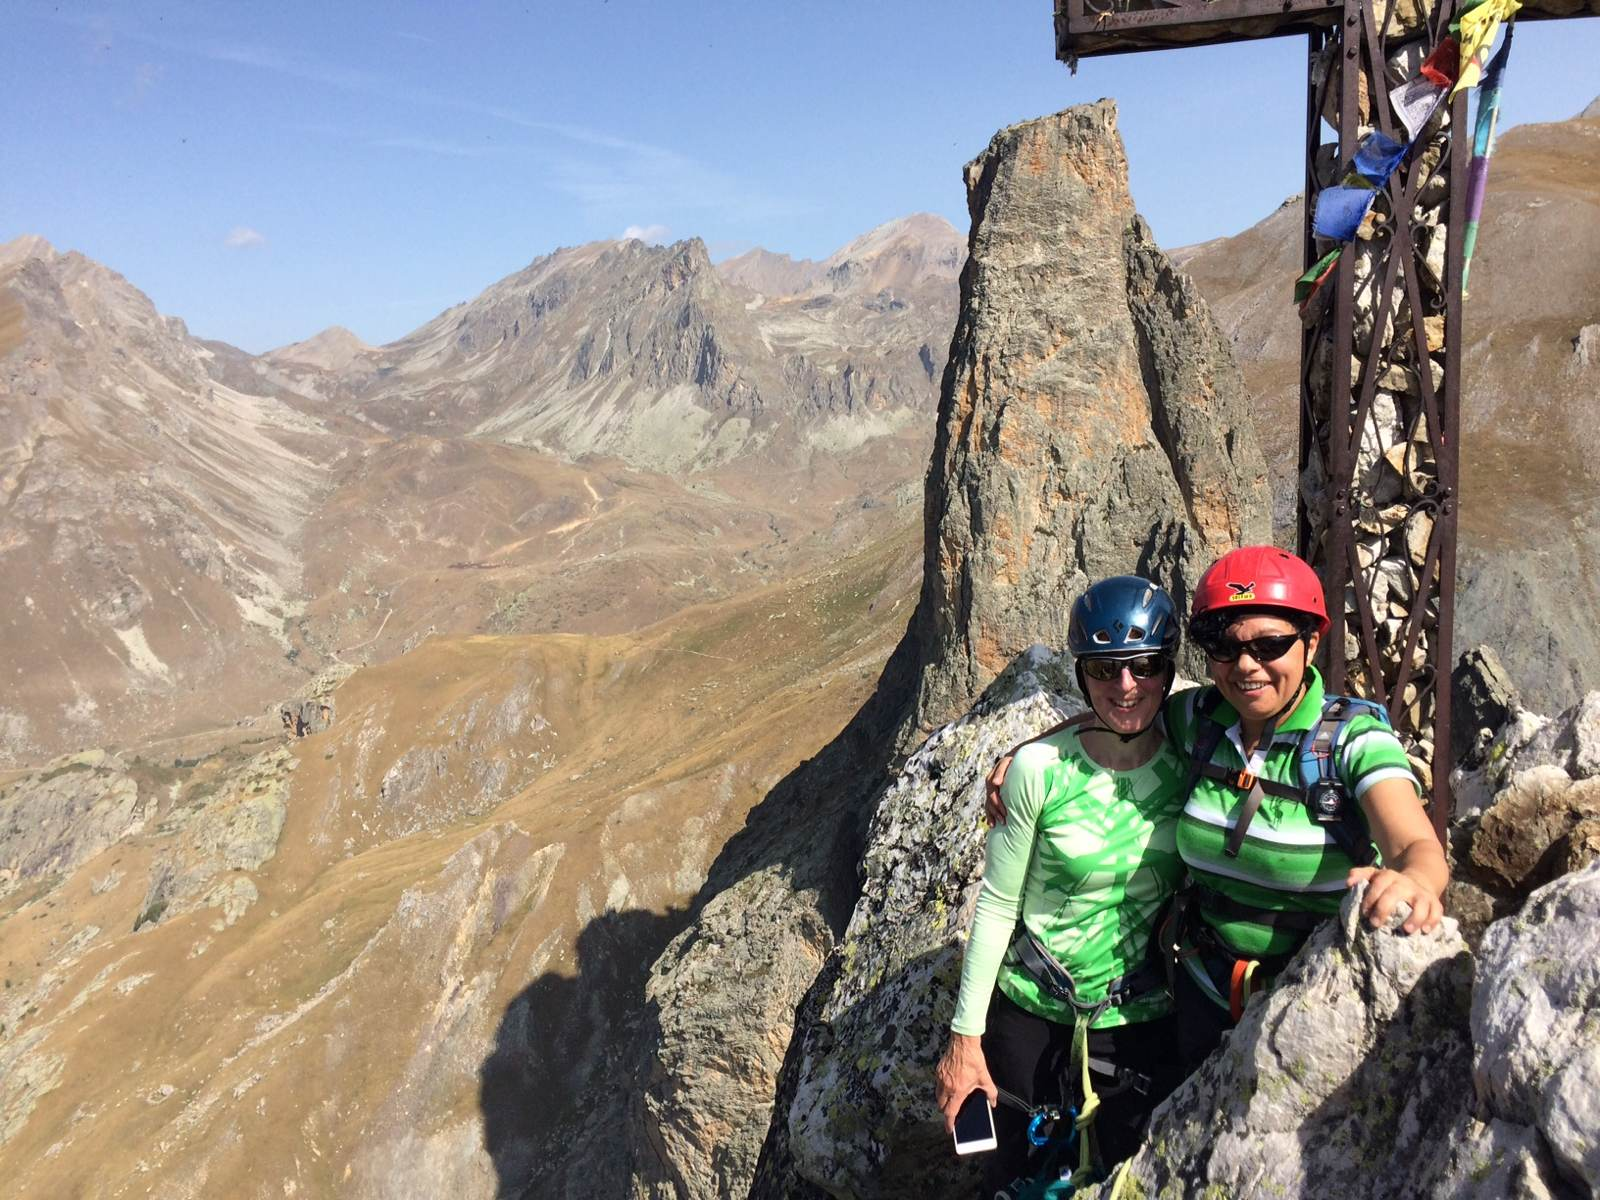 Klettertour Rocca Provenzale / Valle Maira